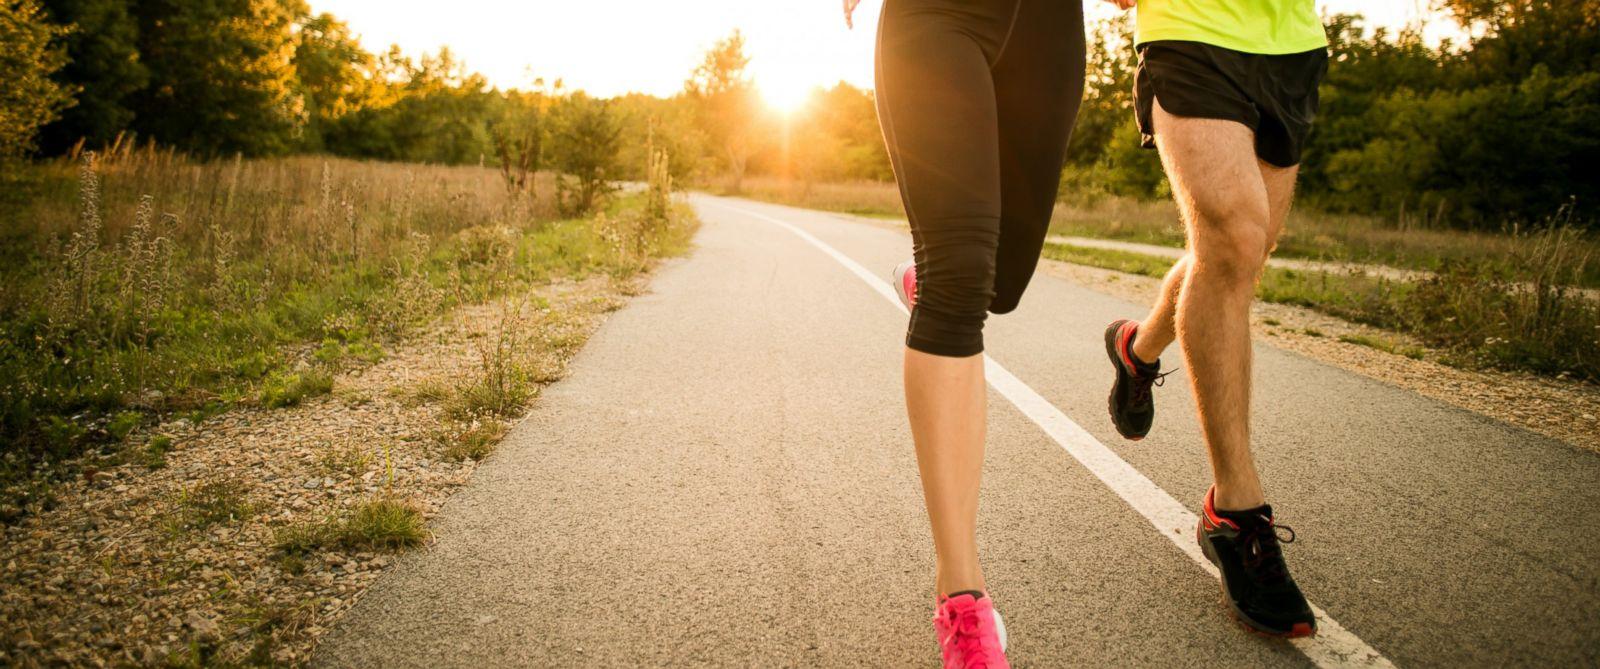 Risultati immagini per running